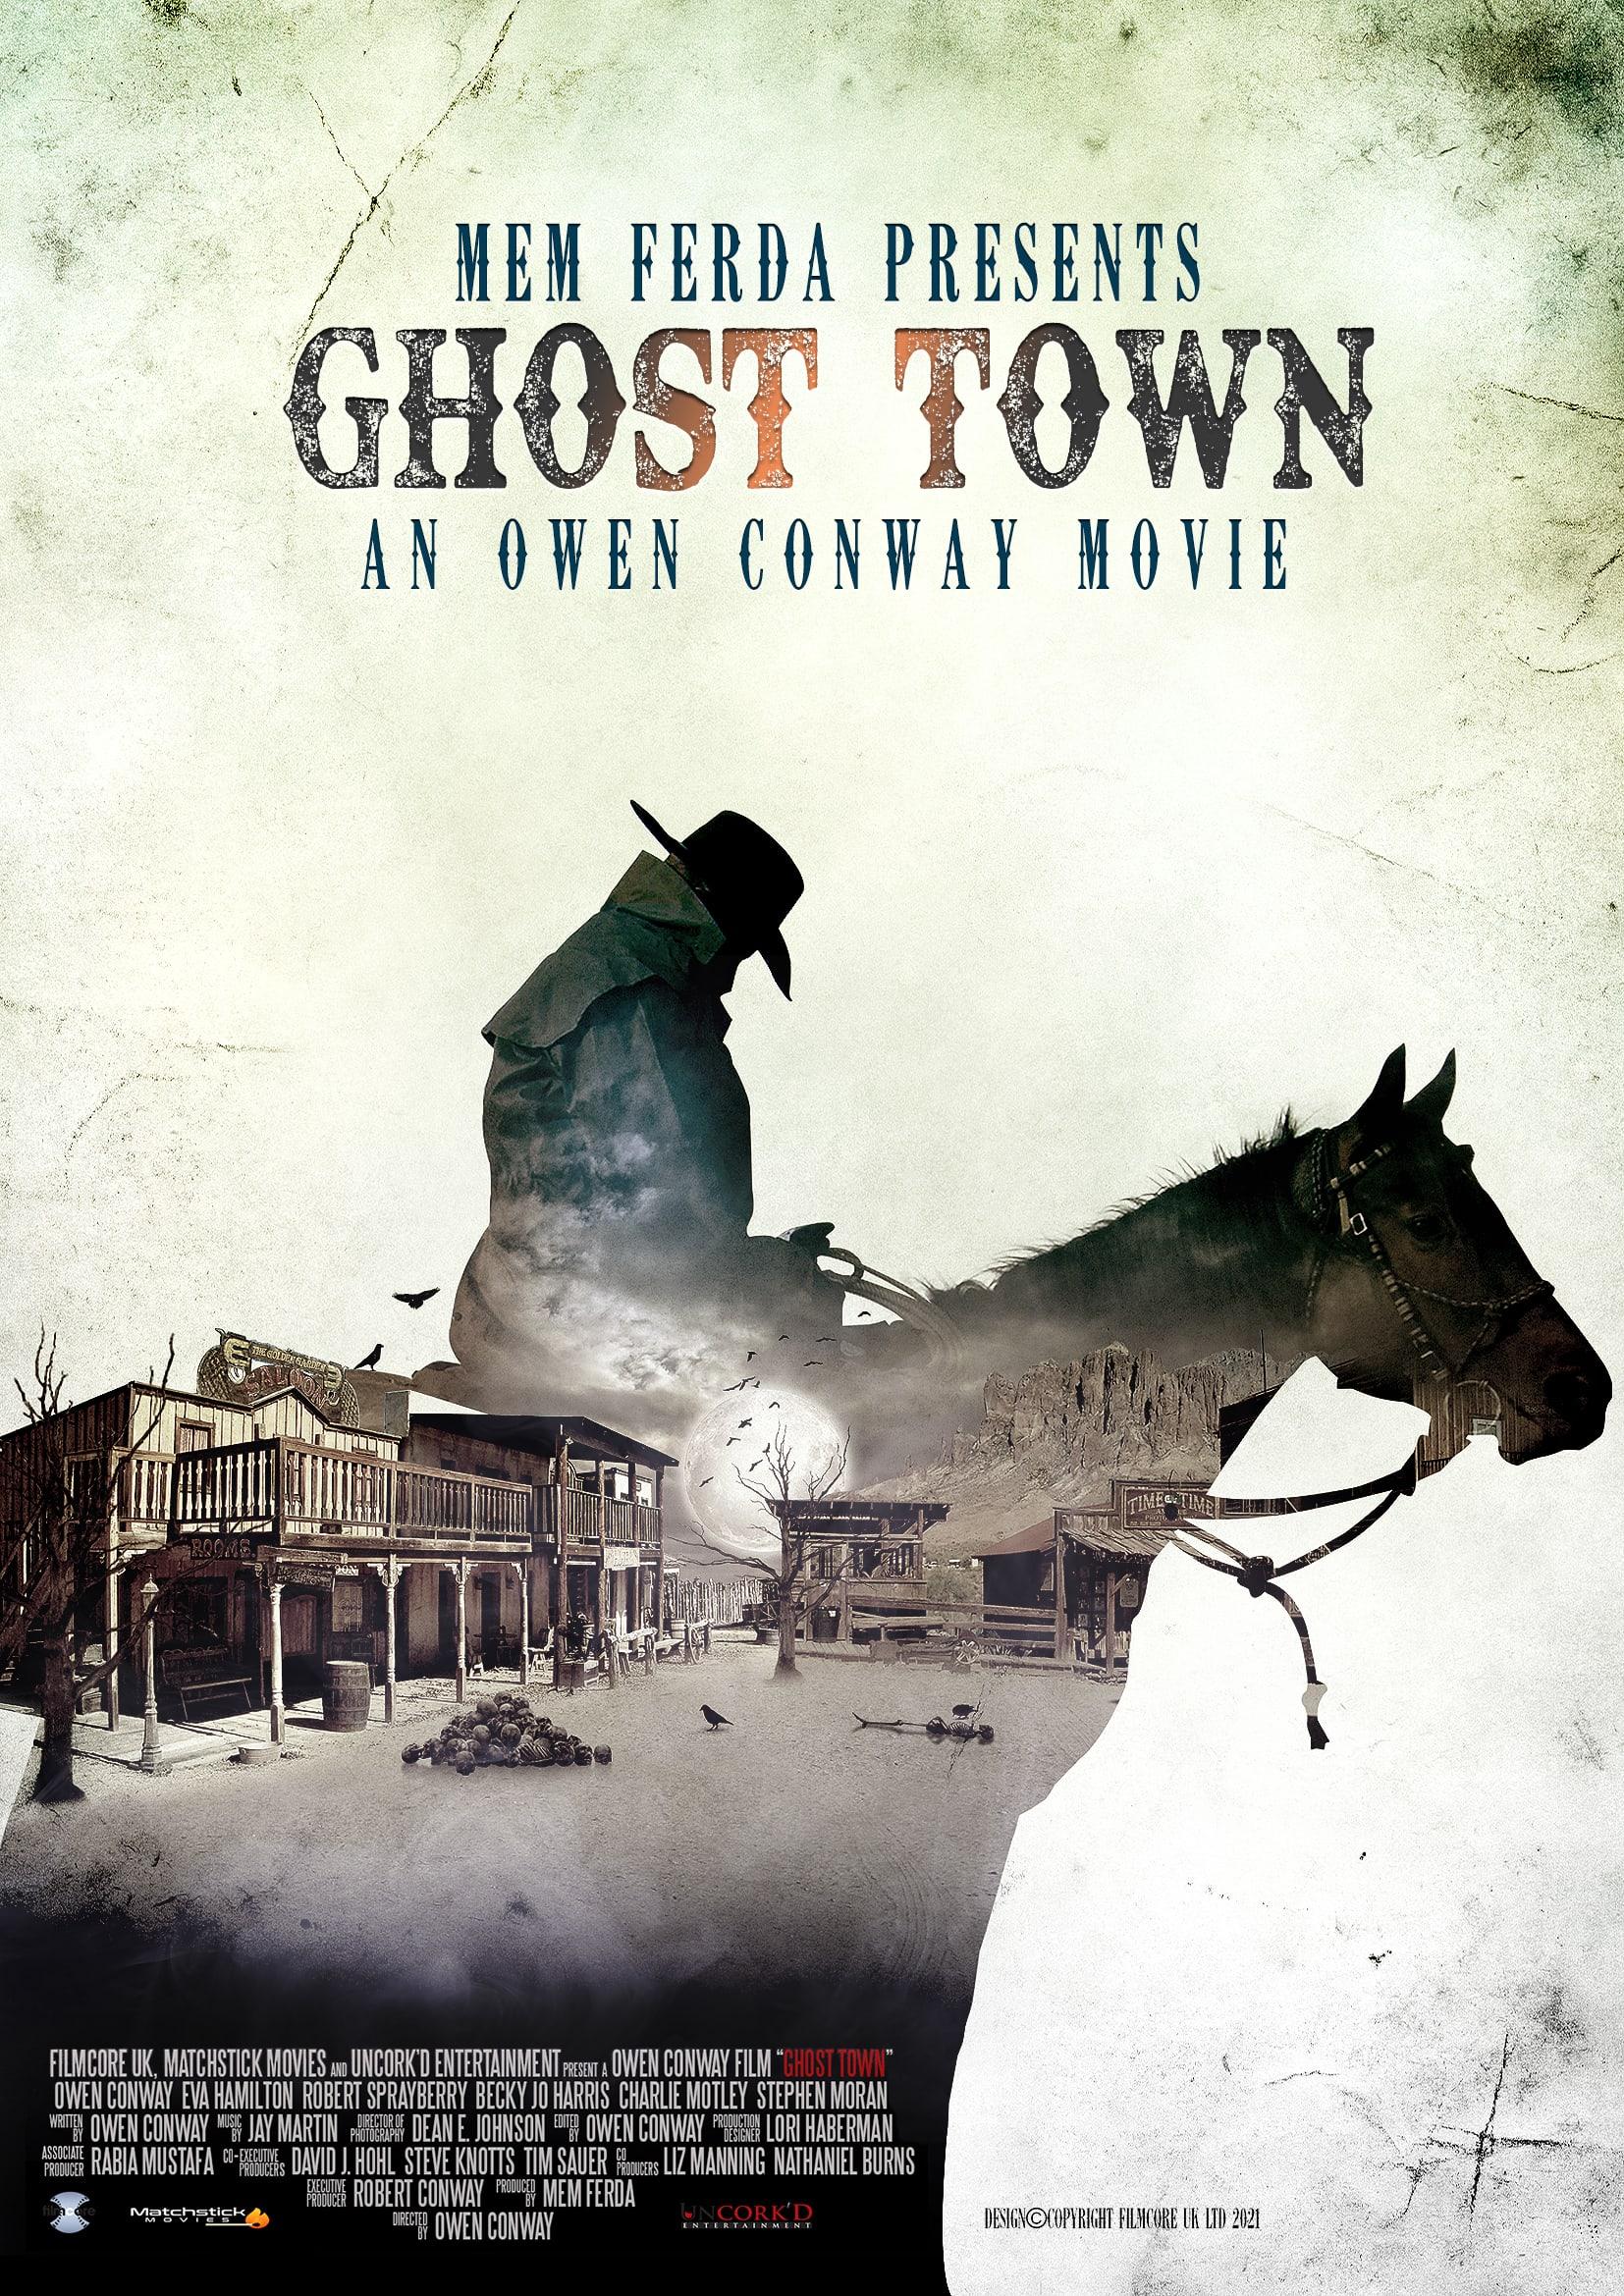 Mem Ferda Pushes the Boundaries of Cinema In New Genre-Bending Masterpiece, 'GHOST TOWN'